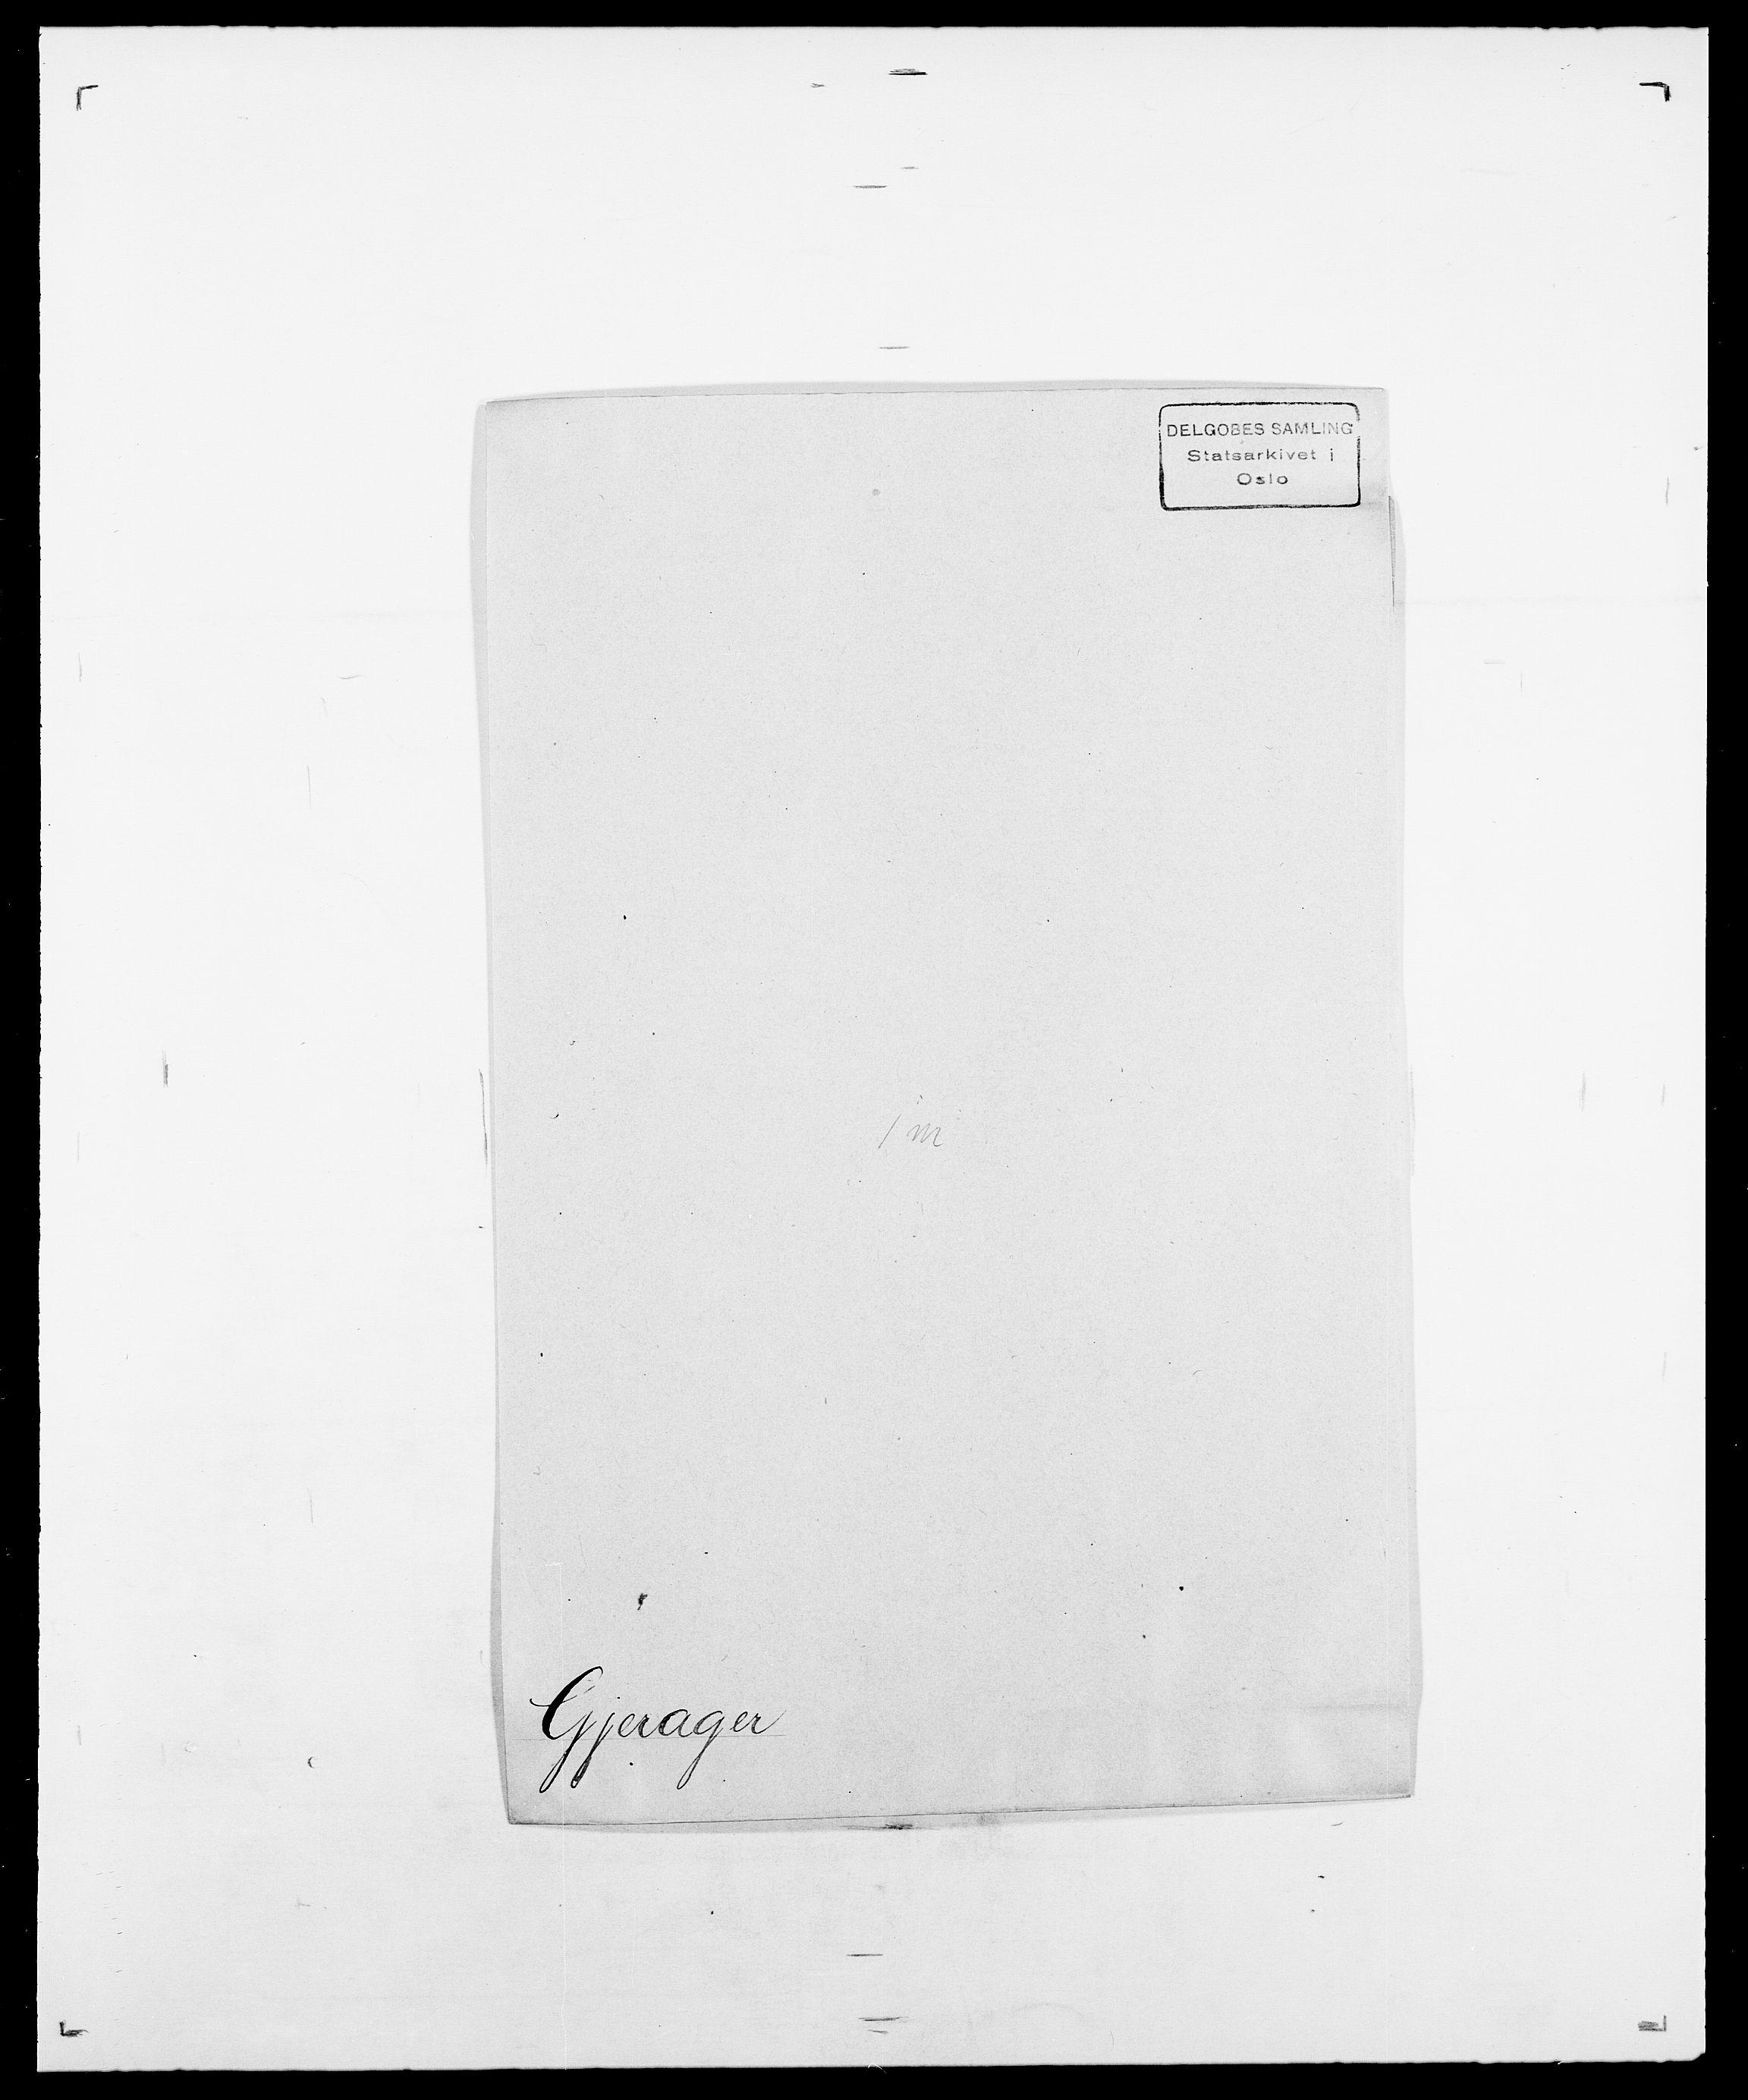 SAO, Delgobe, Charles Antoine - samling, D/Da/L0014: Giebdhausen - Grip, s. 103